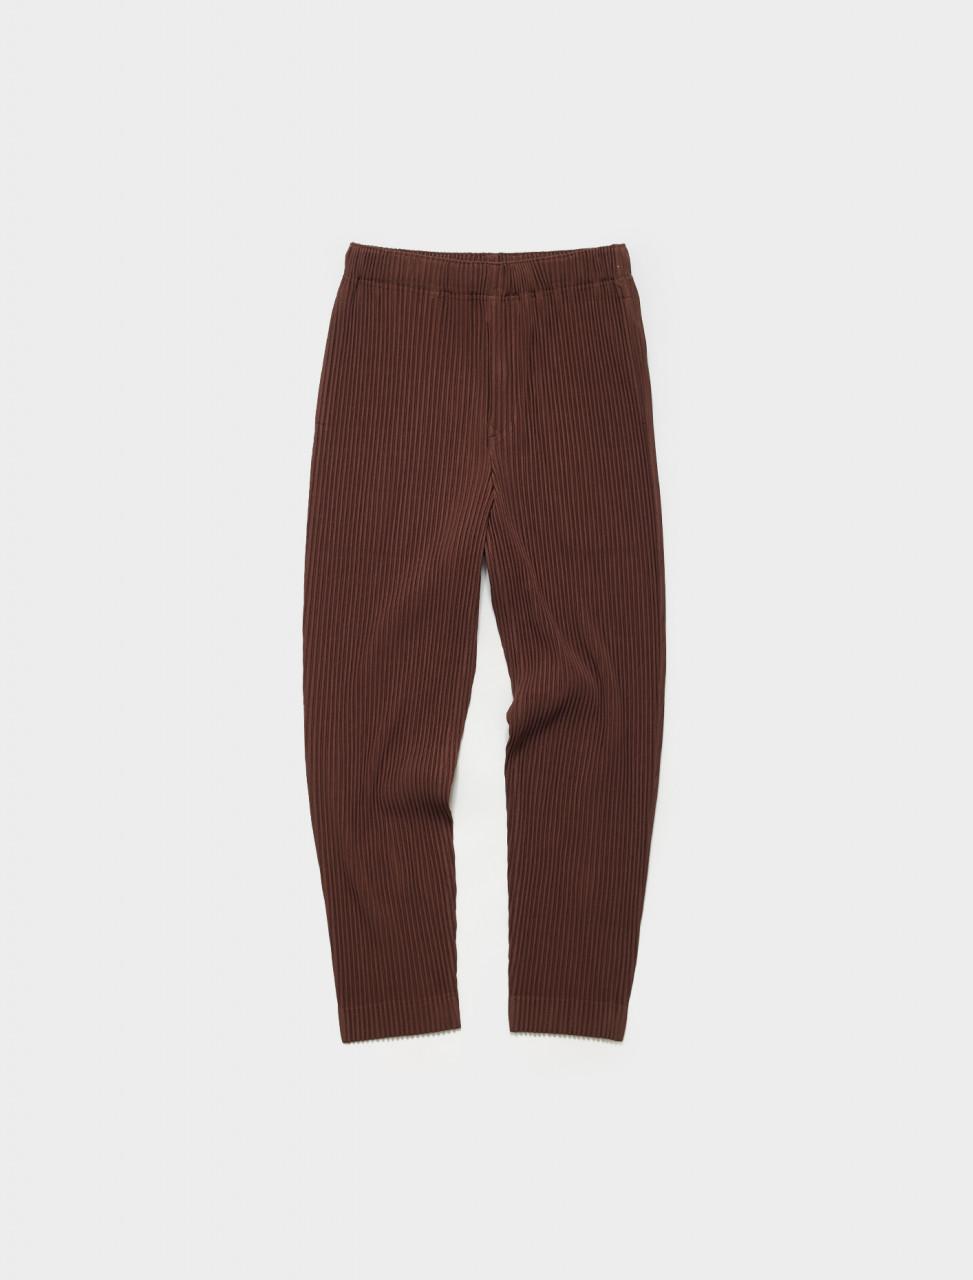 HP16JF128-44 HOMME PLISSE ISSEY MIYAKE Pleated Trousers in Burnt Umber Brown